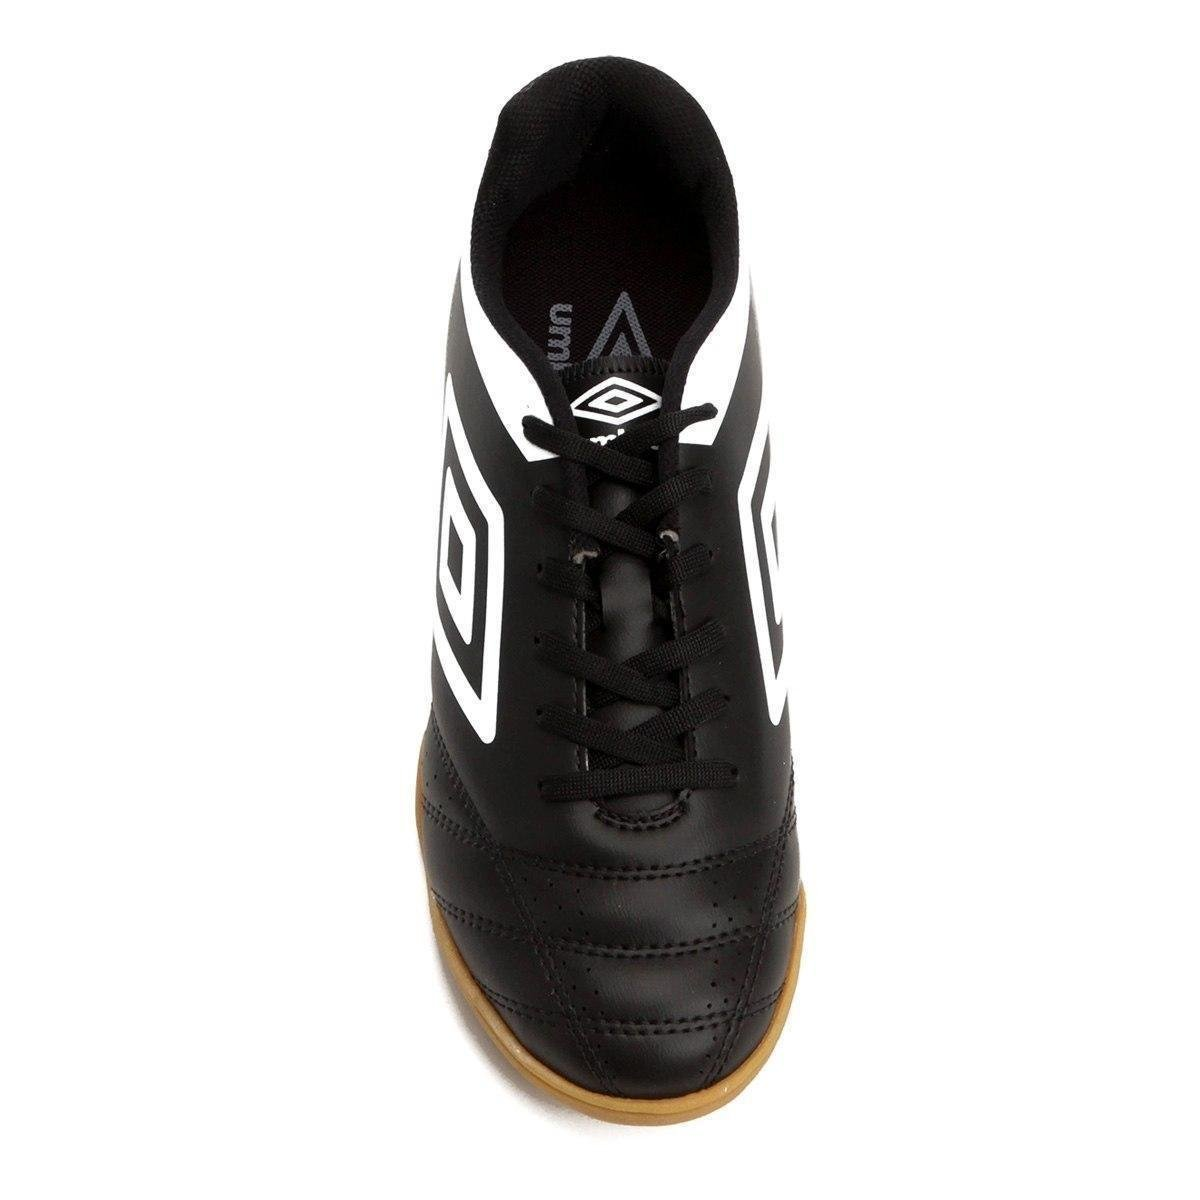 Chuteira Futsal Umbro Striker IV - Preto e Branco - Compre Agora ... 9b8b2b0f91849